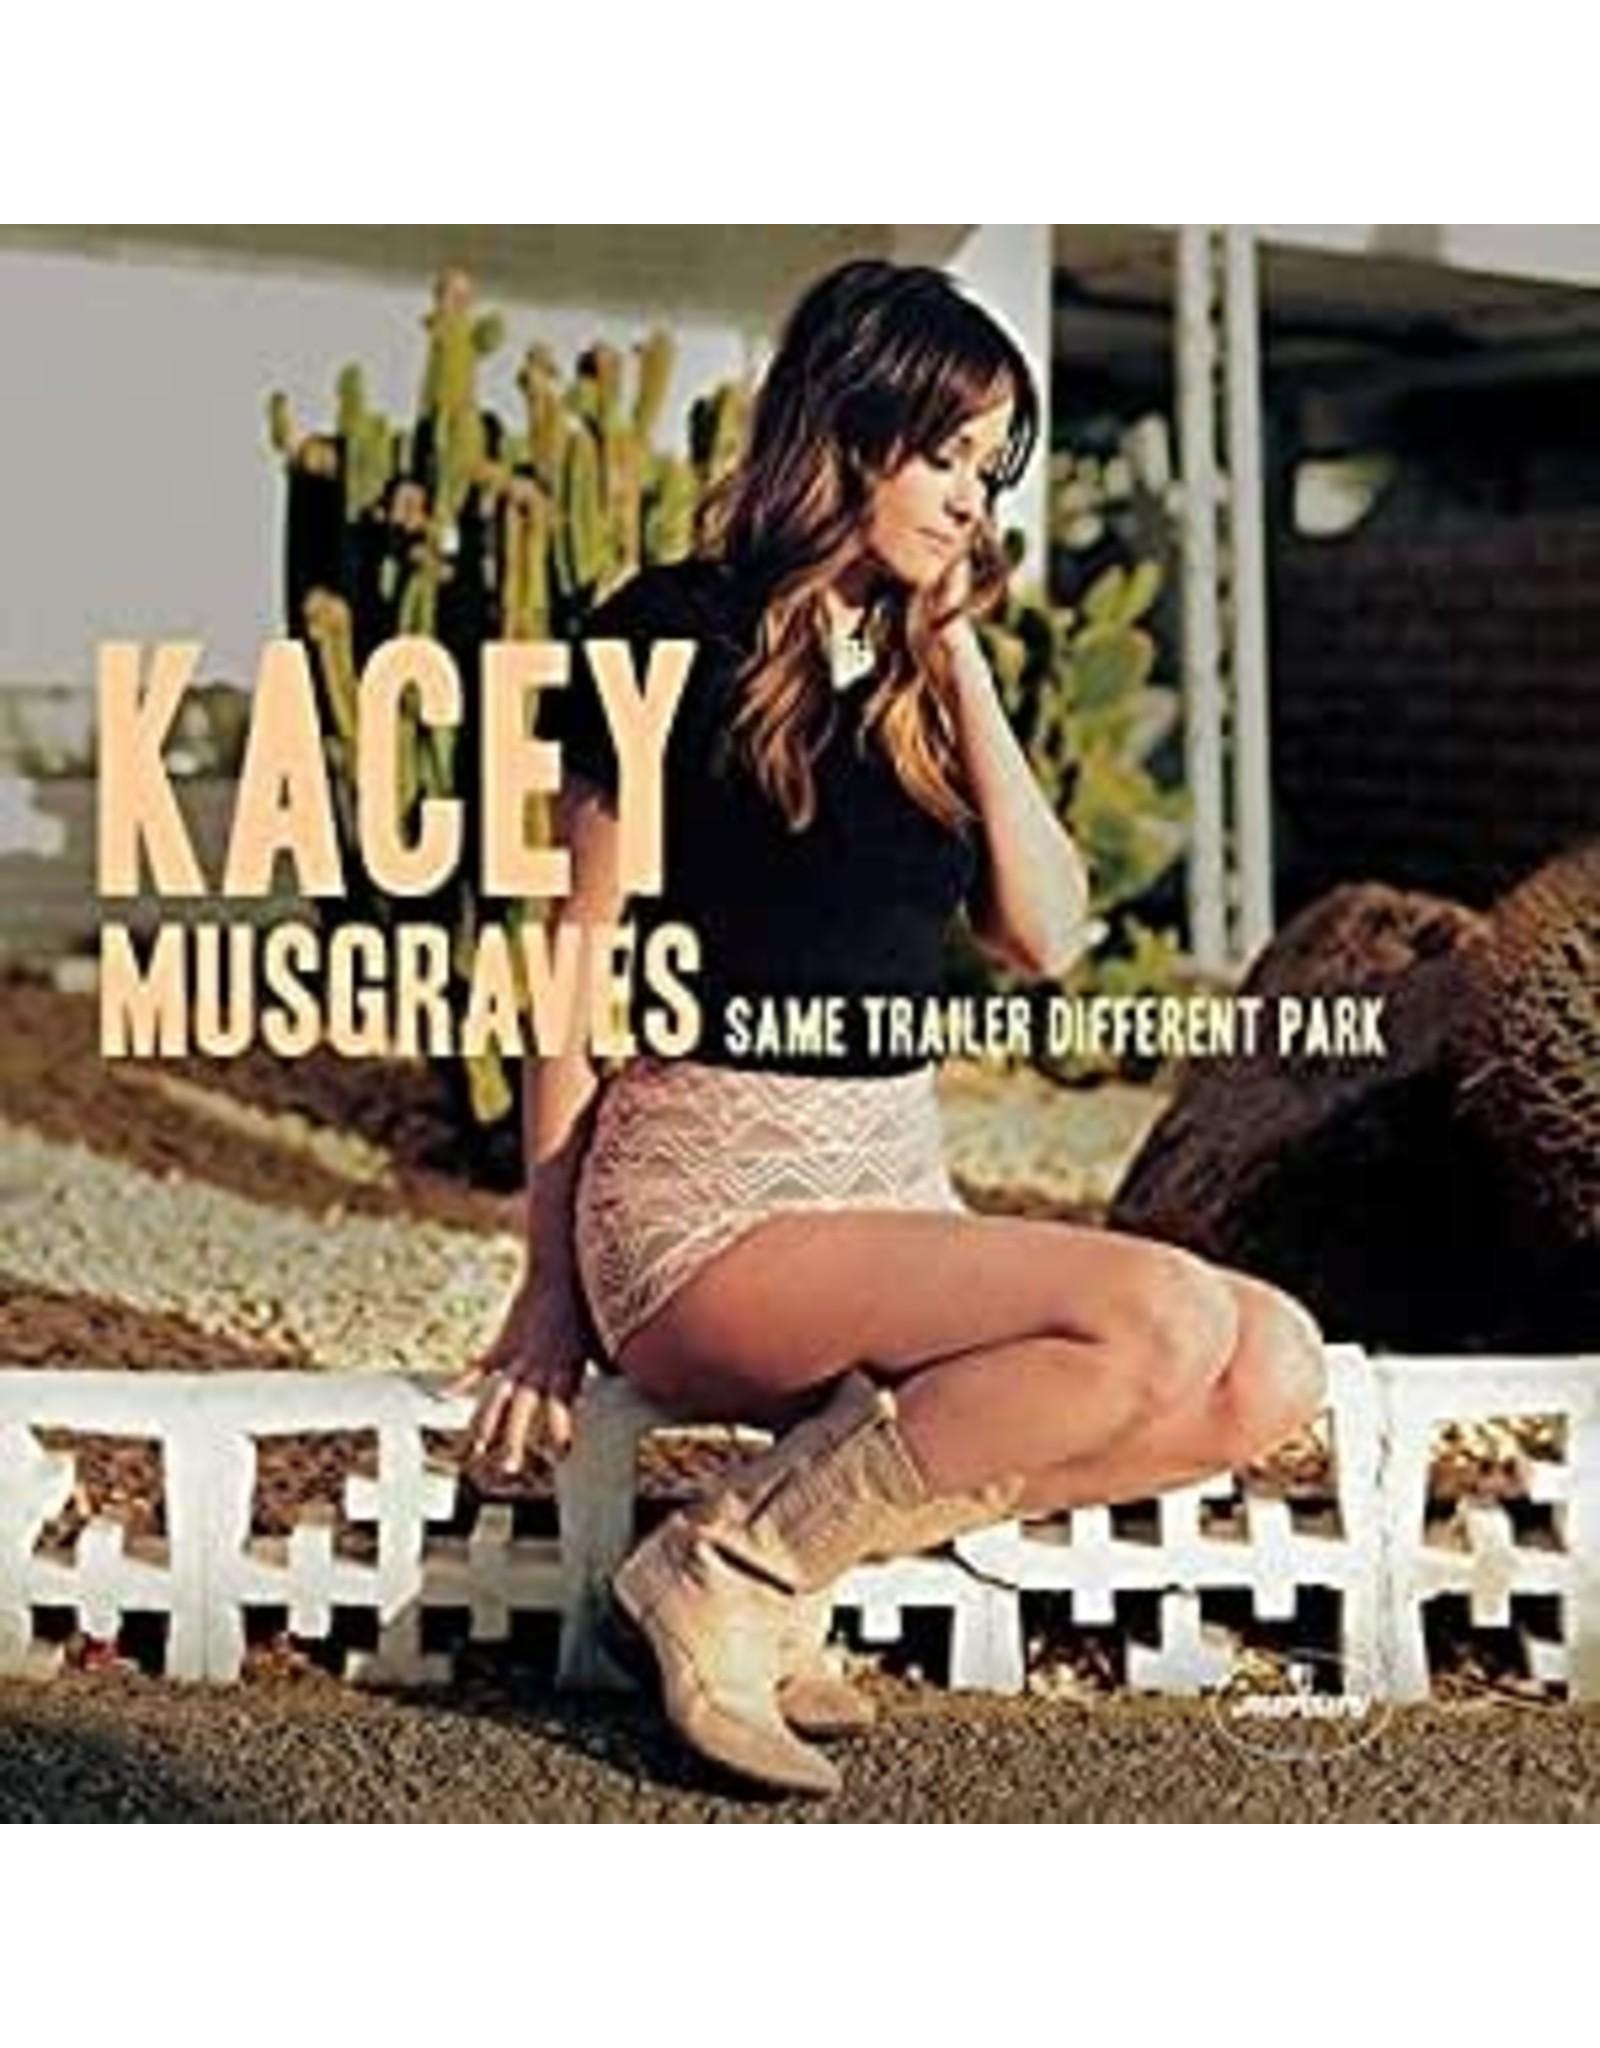 New Vinyl Kacey Musgraves - Same Trailer Different Park LP